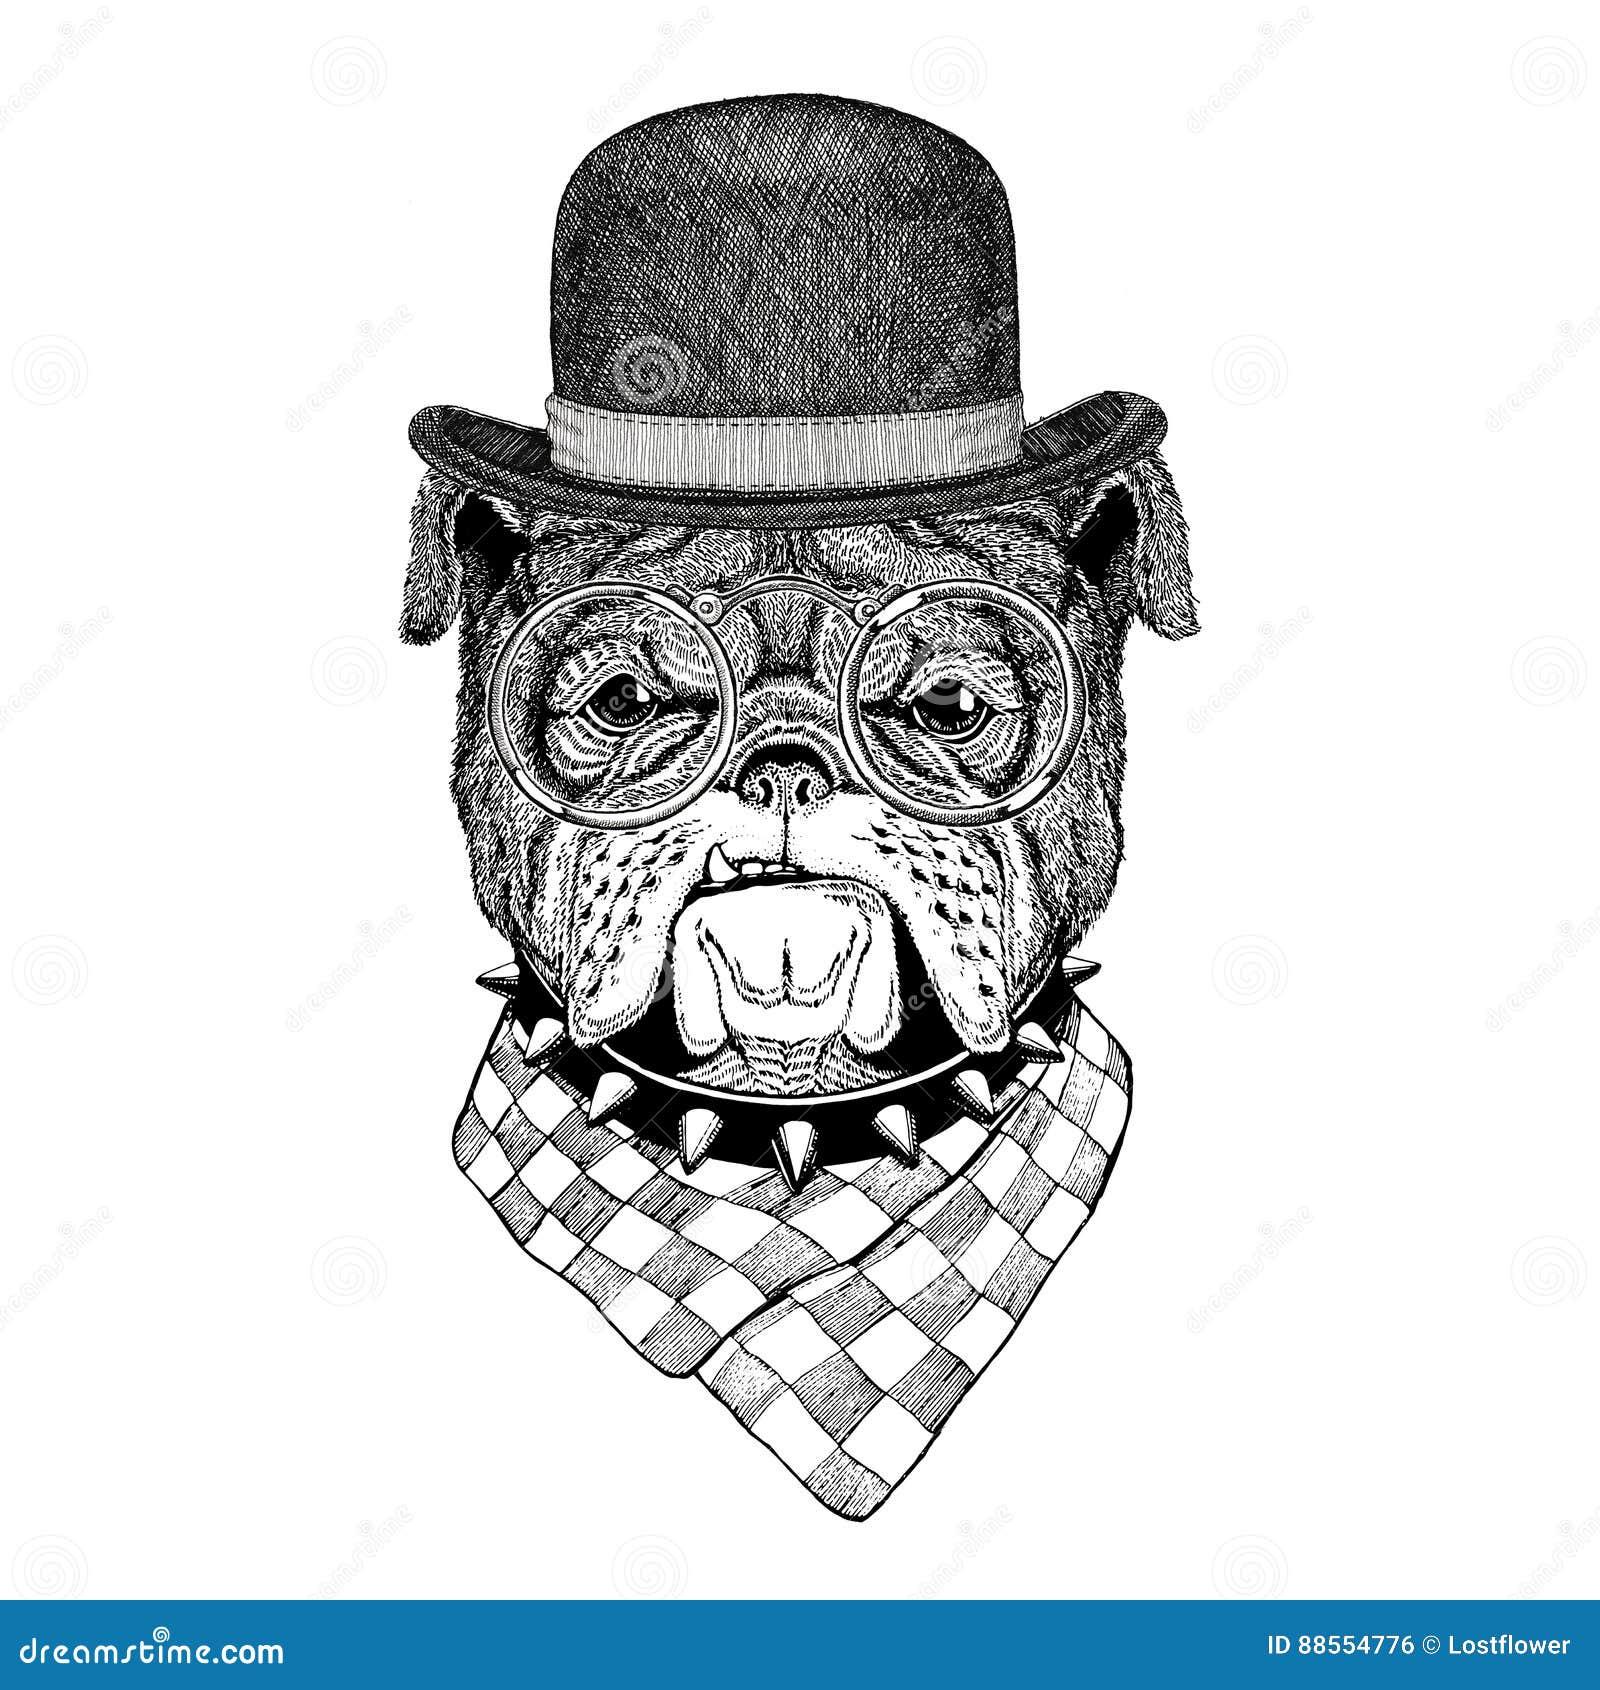 Bulldog image for tattoo logo emblem badge design stock for Tattoo style logo design